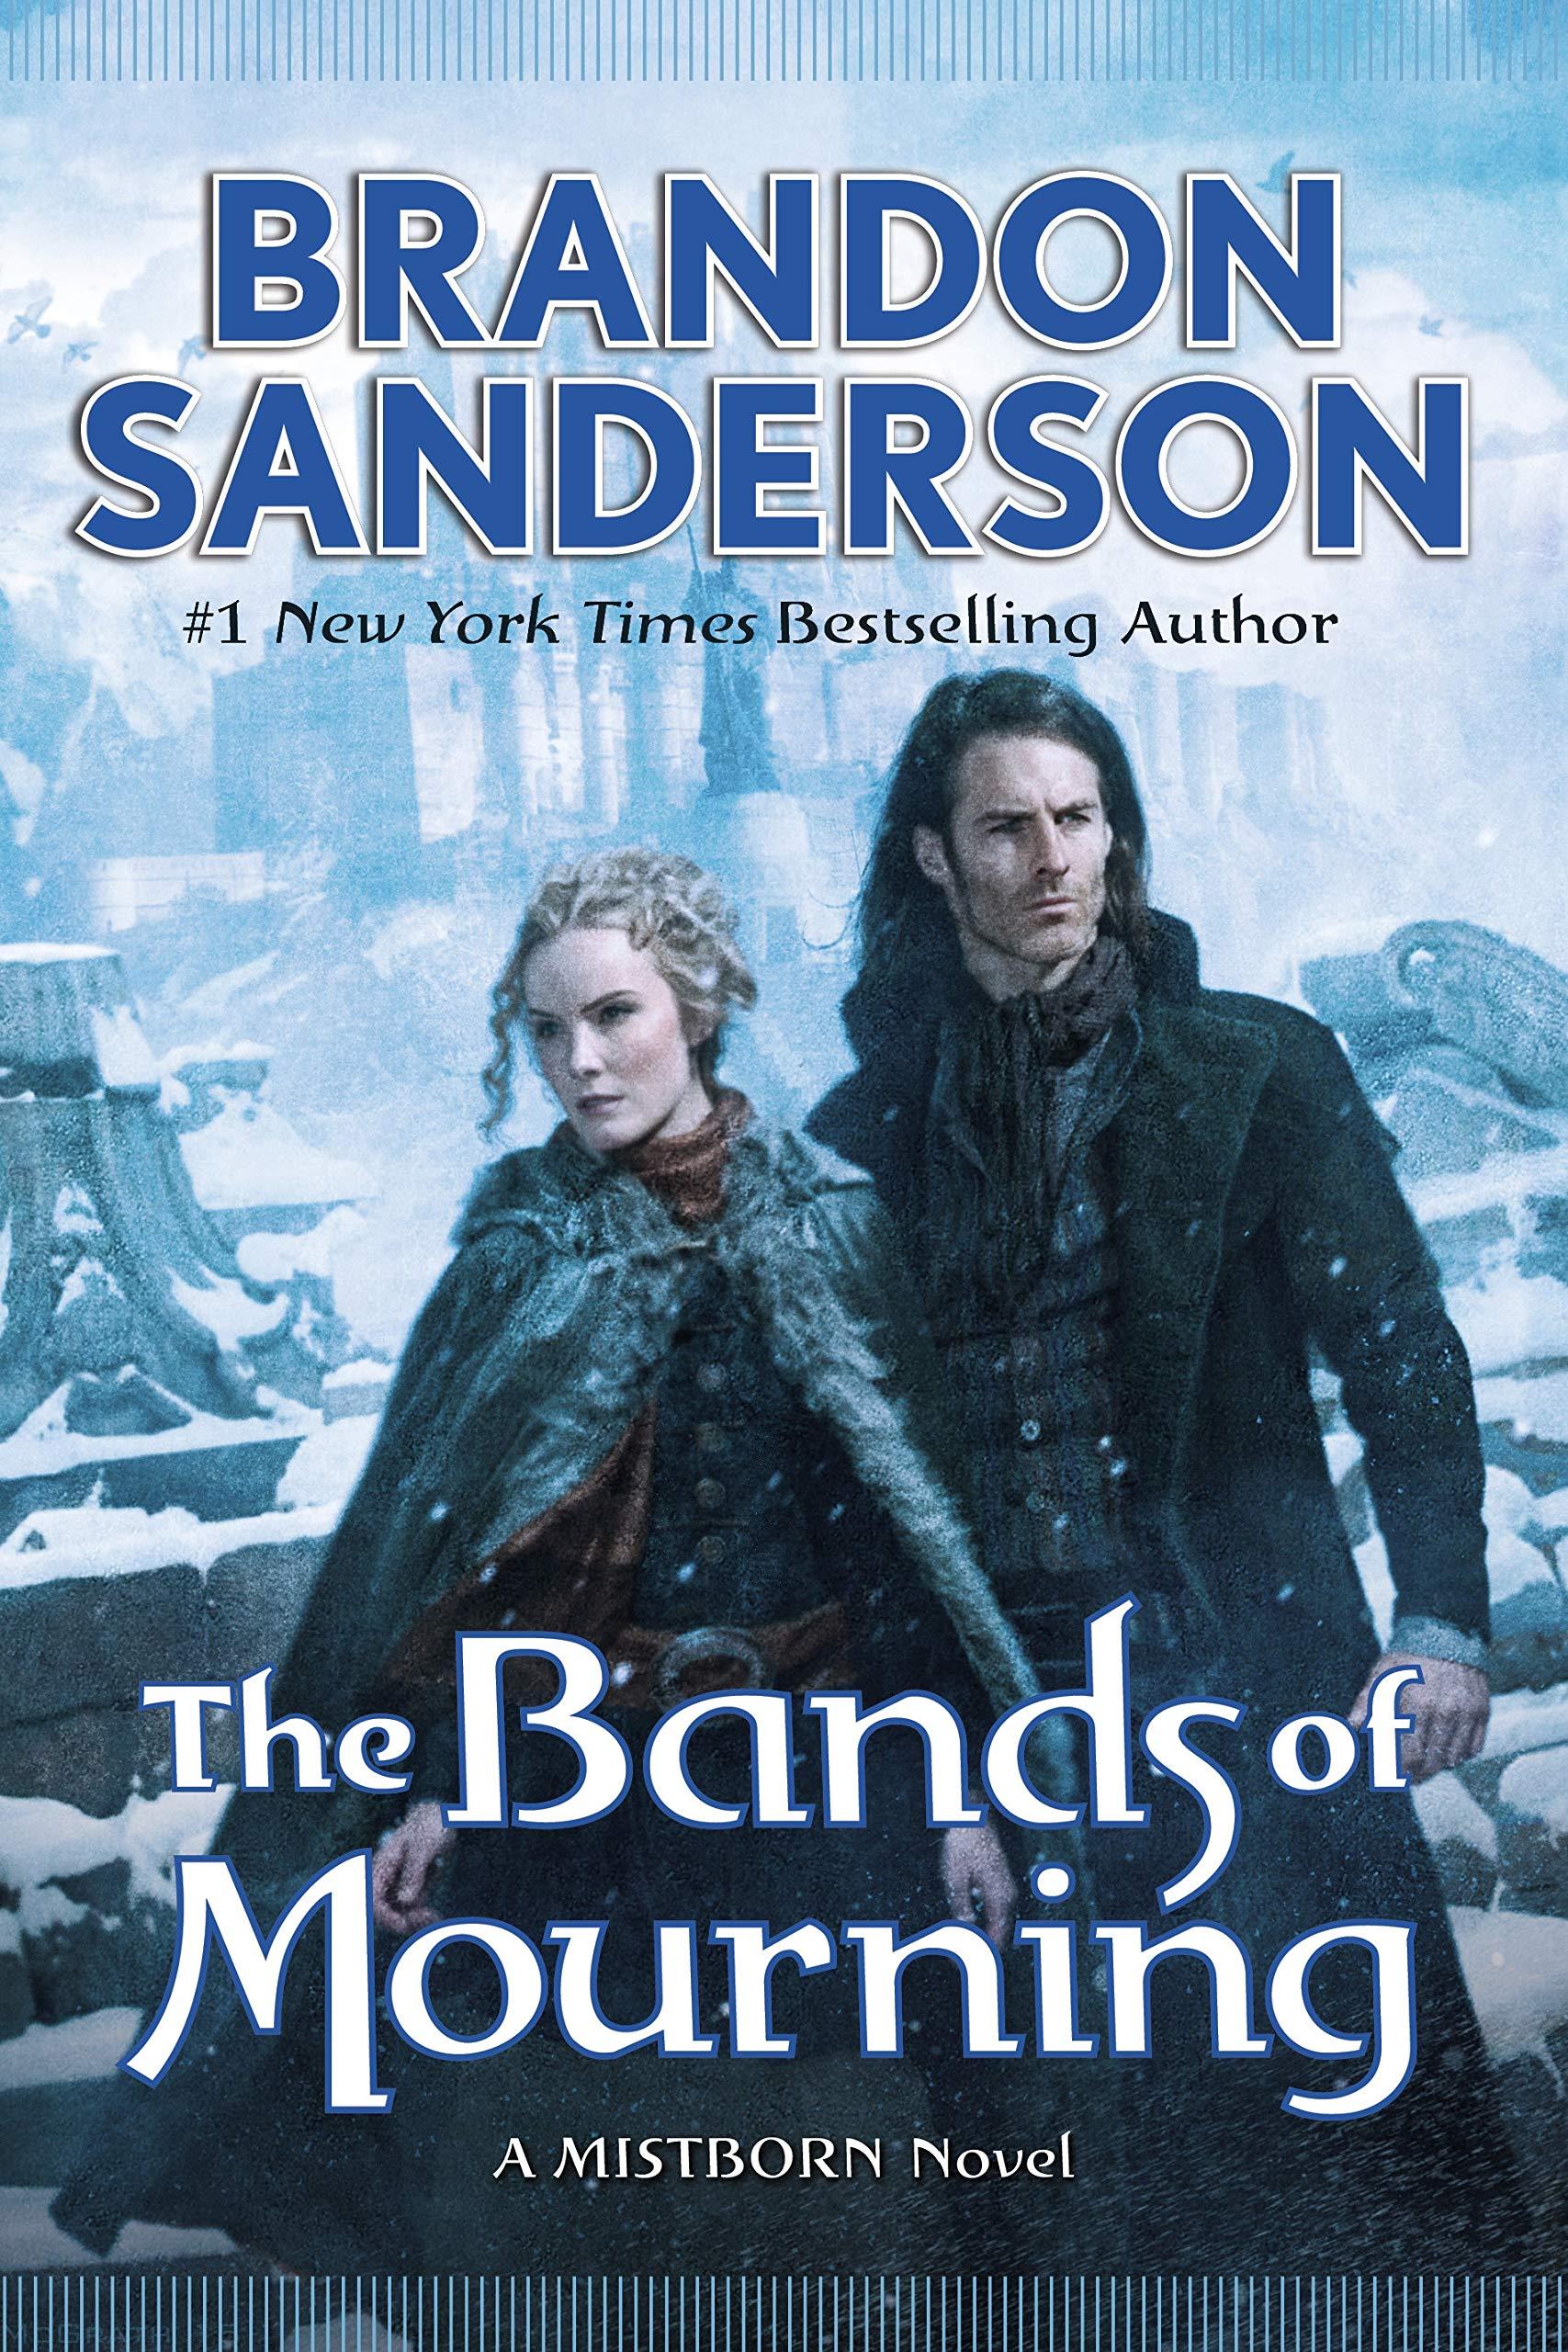 Mistborn #6 Bands of Mourning - Brandon Sanderson